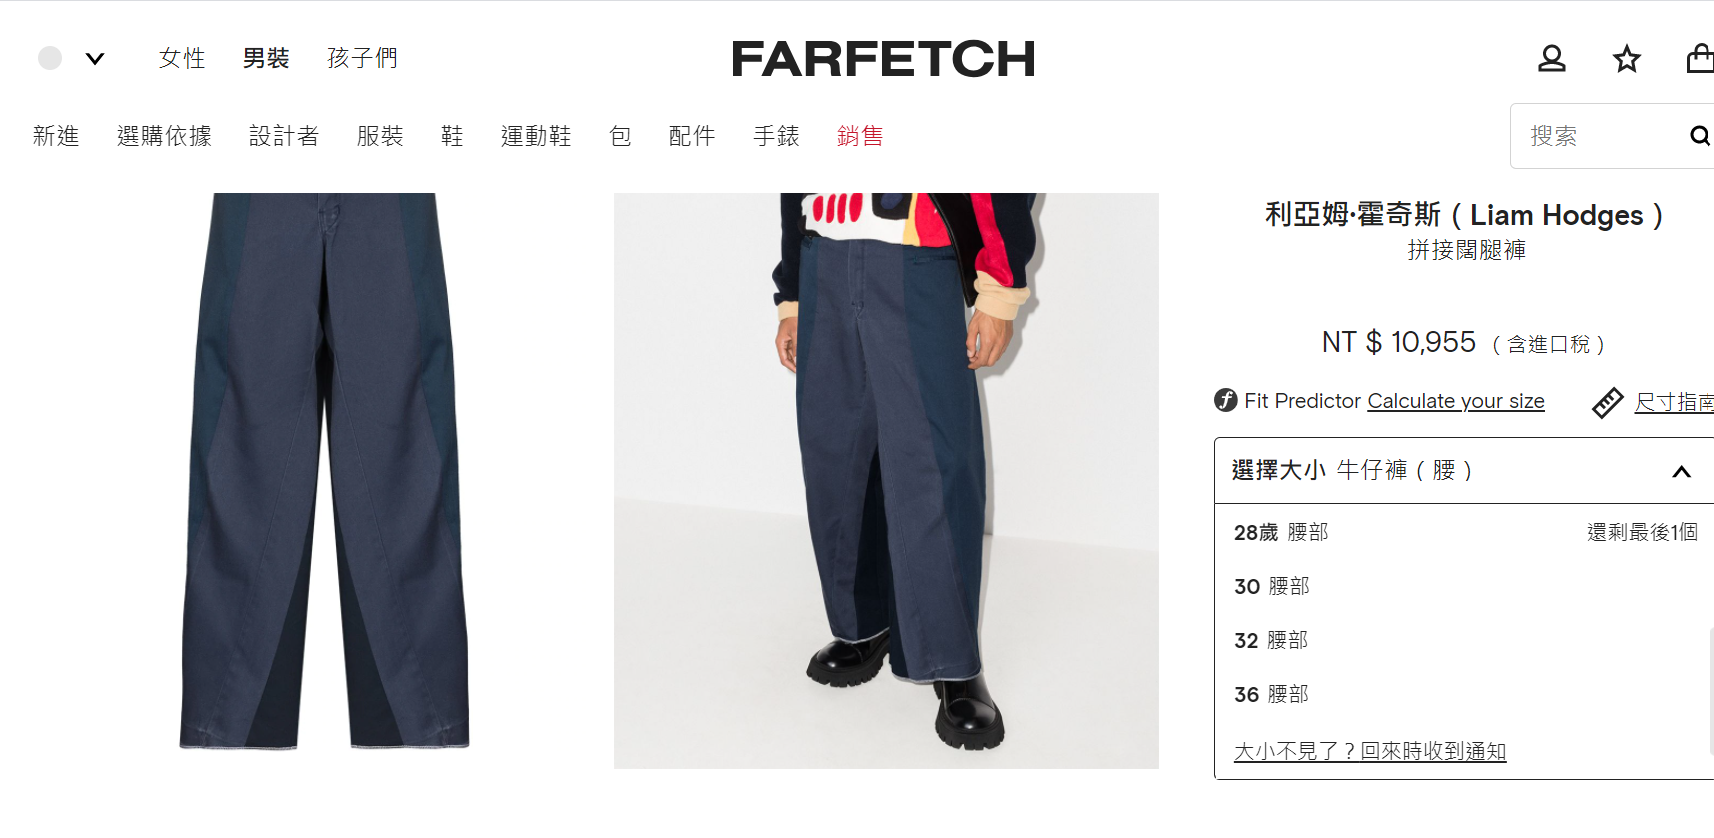 farfetch尺寸表